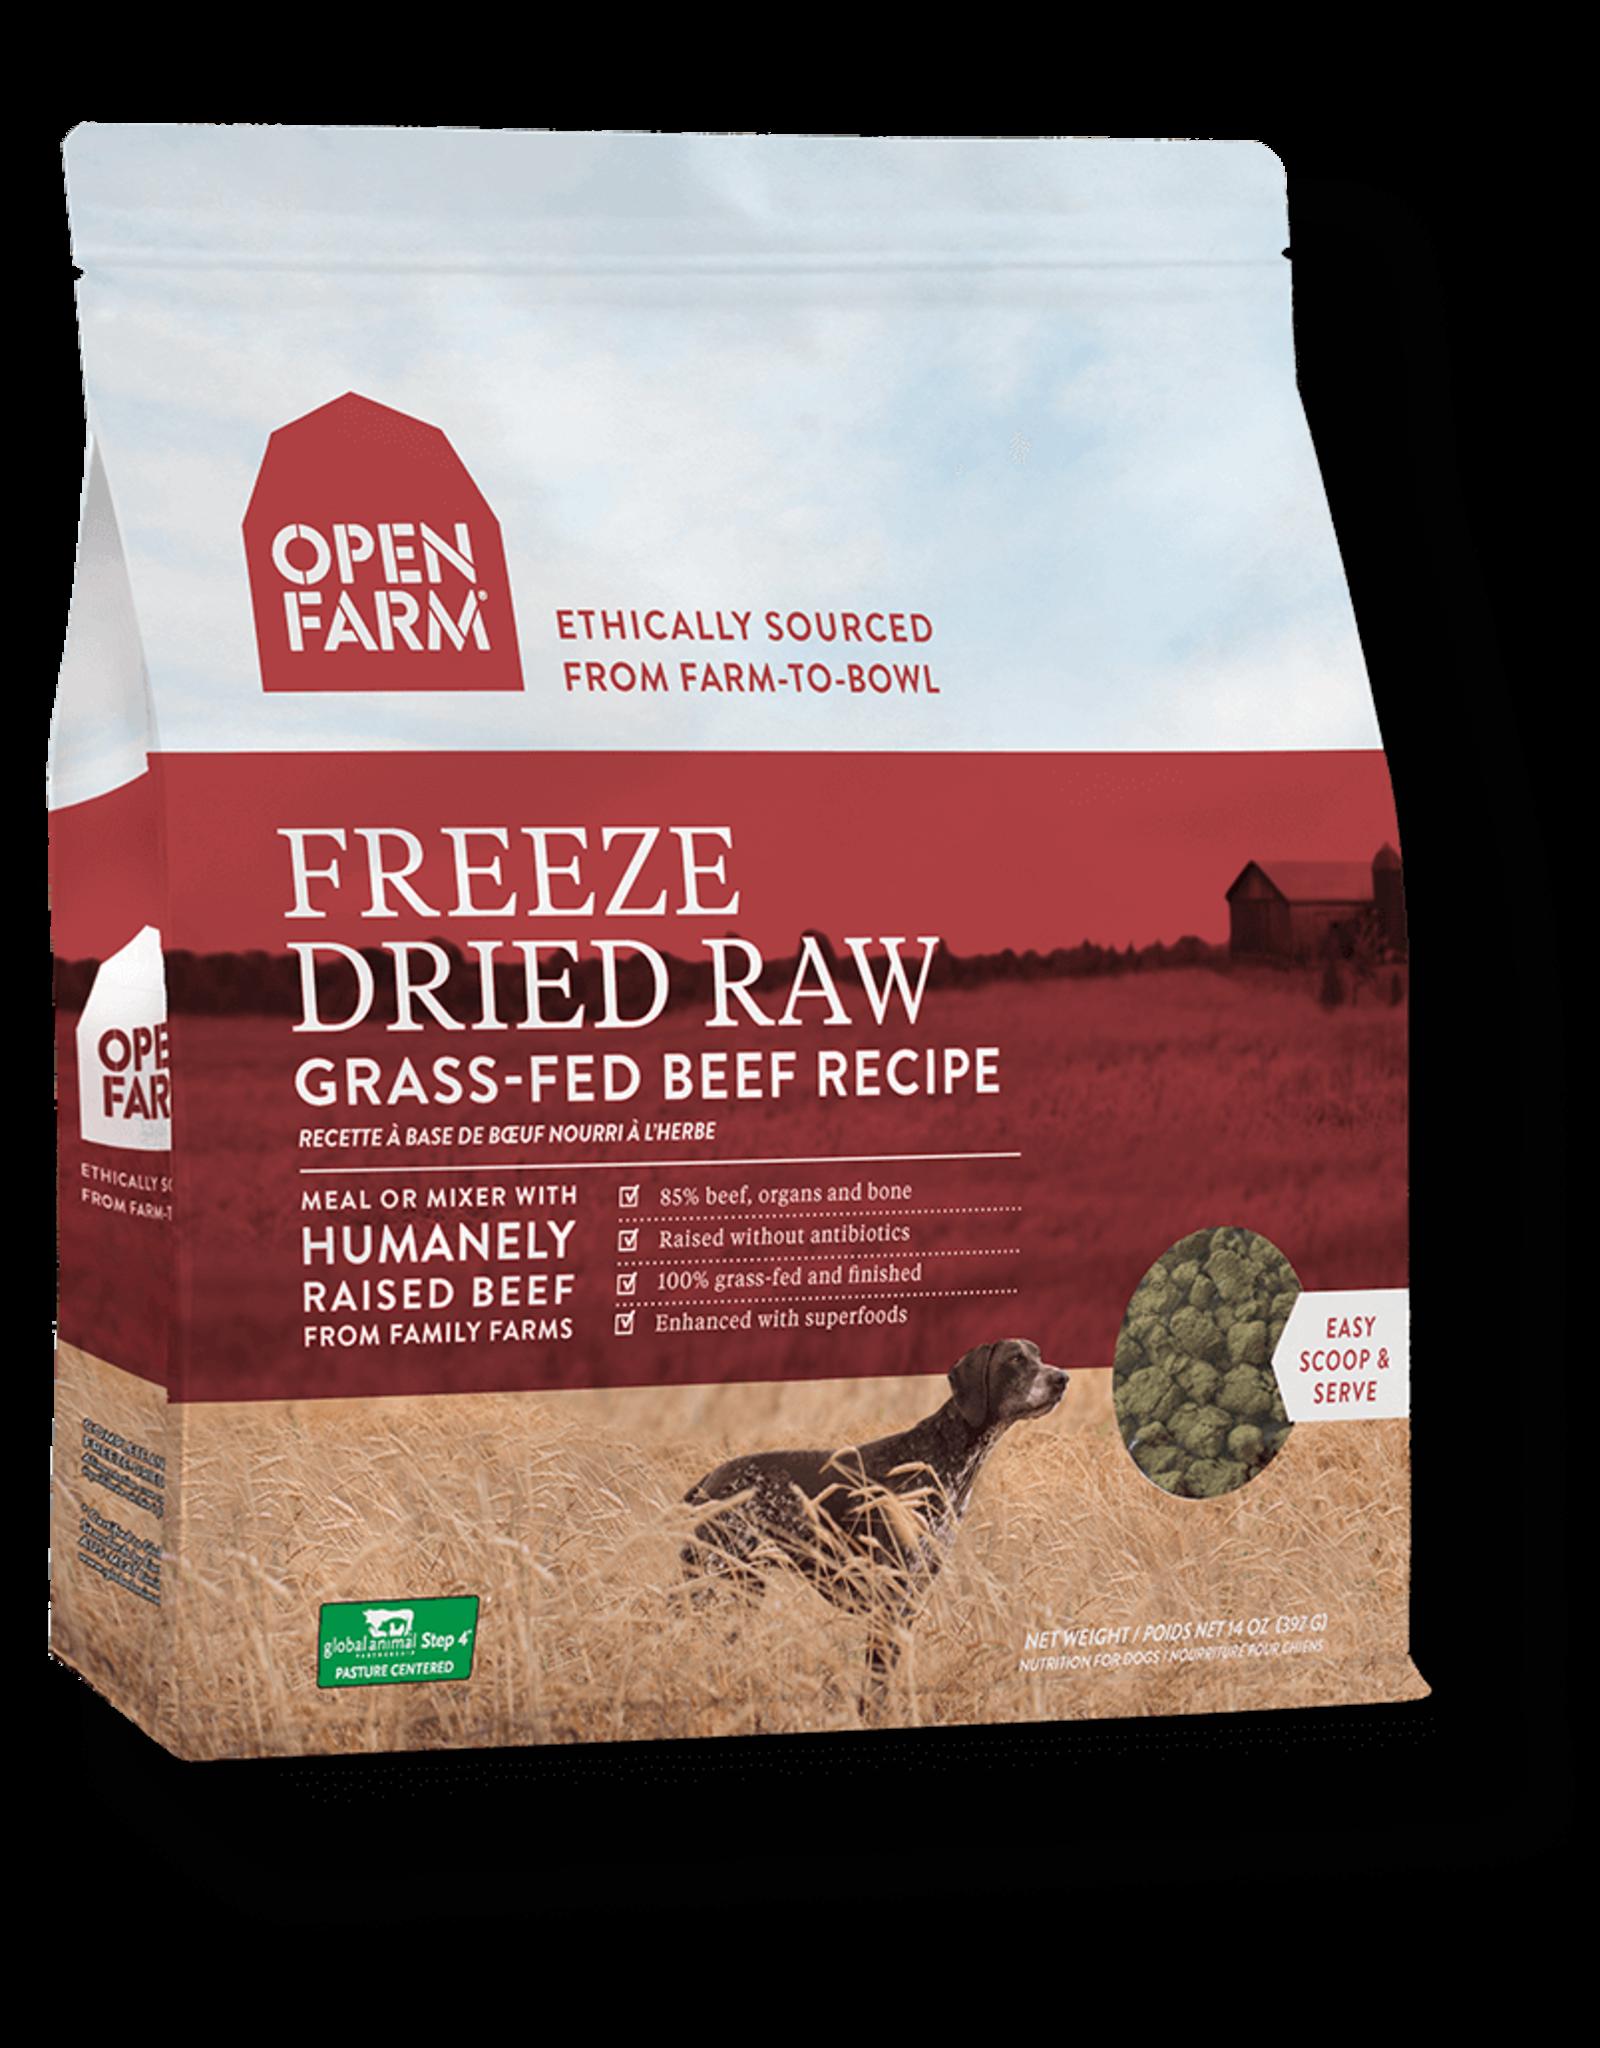 Open Farm OPEN FARM DOG FREEZE DRIED RAW GRASS-FED BEEF RECIPE